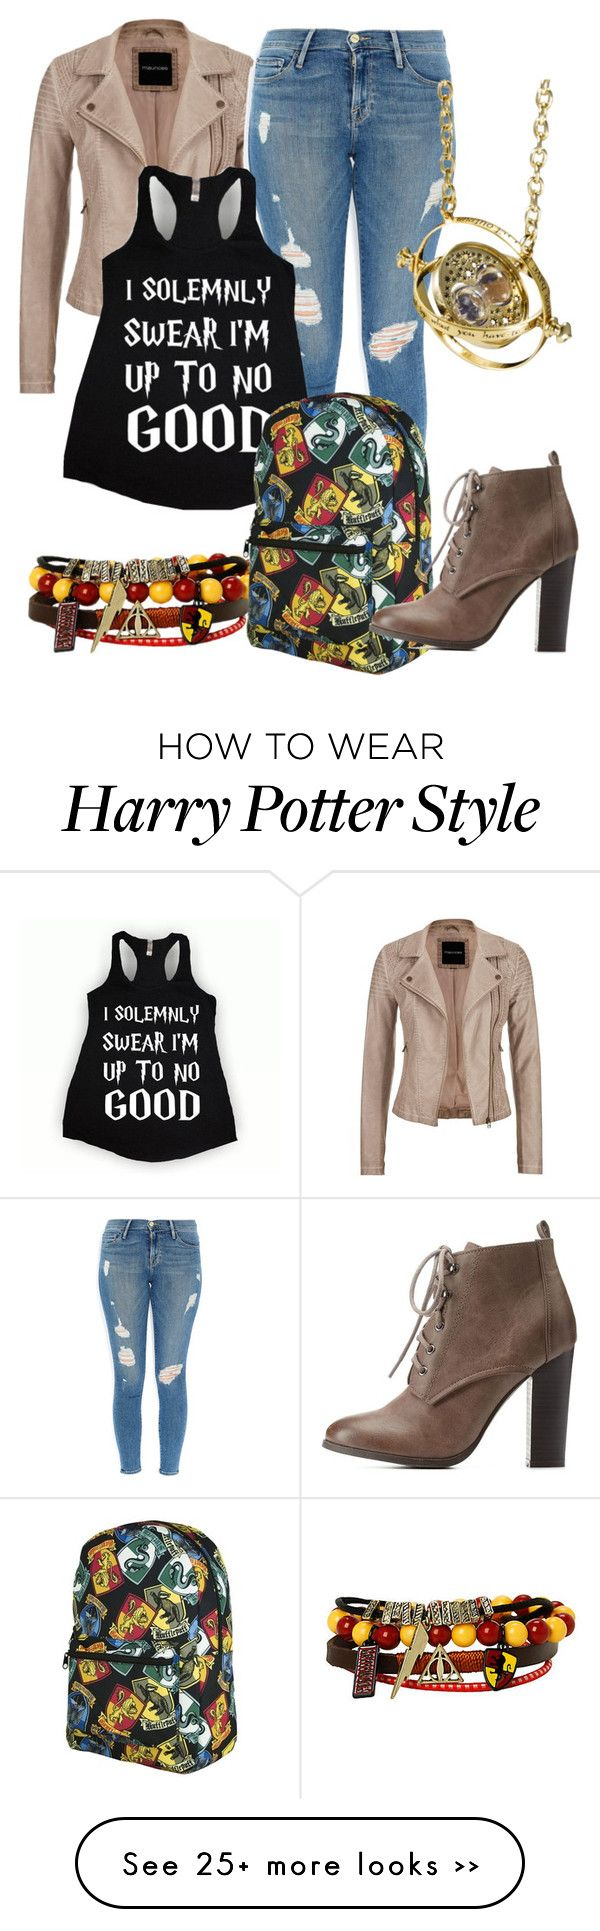 """Harry Potter at School"" by flutegirlcap on Polyvore featuring moda, maurices, Frame Denim, Dash e Charlotte Russe"